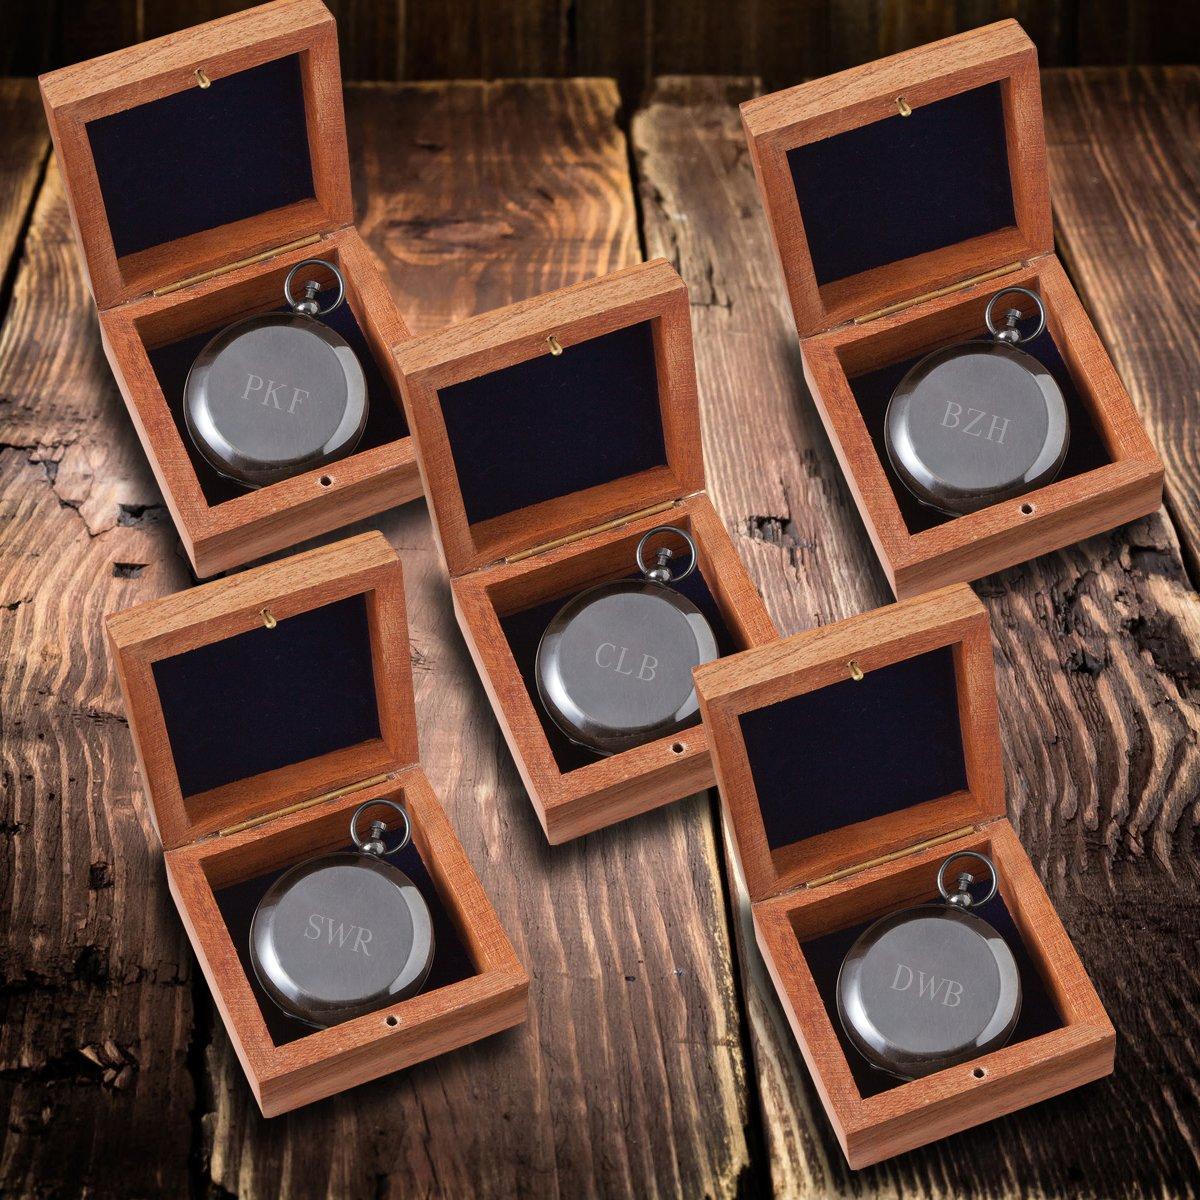 Personalizedガンメタル記念品コンパスwith Woodenボックス – セットof 5 – 3イニシャル B07B1HJ9X1